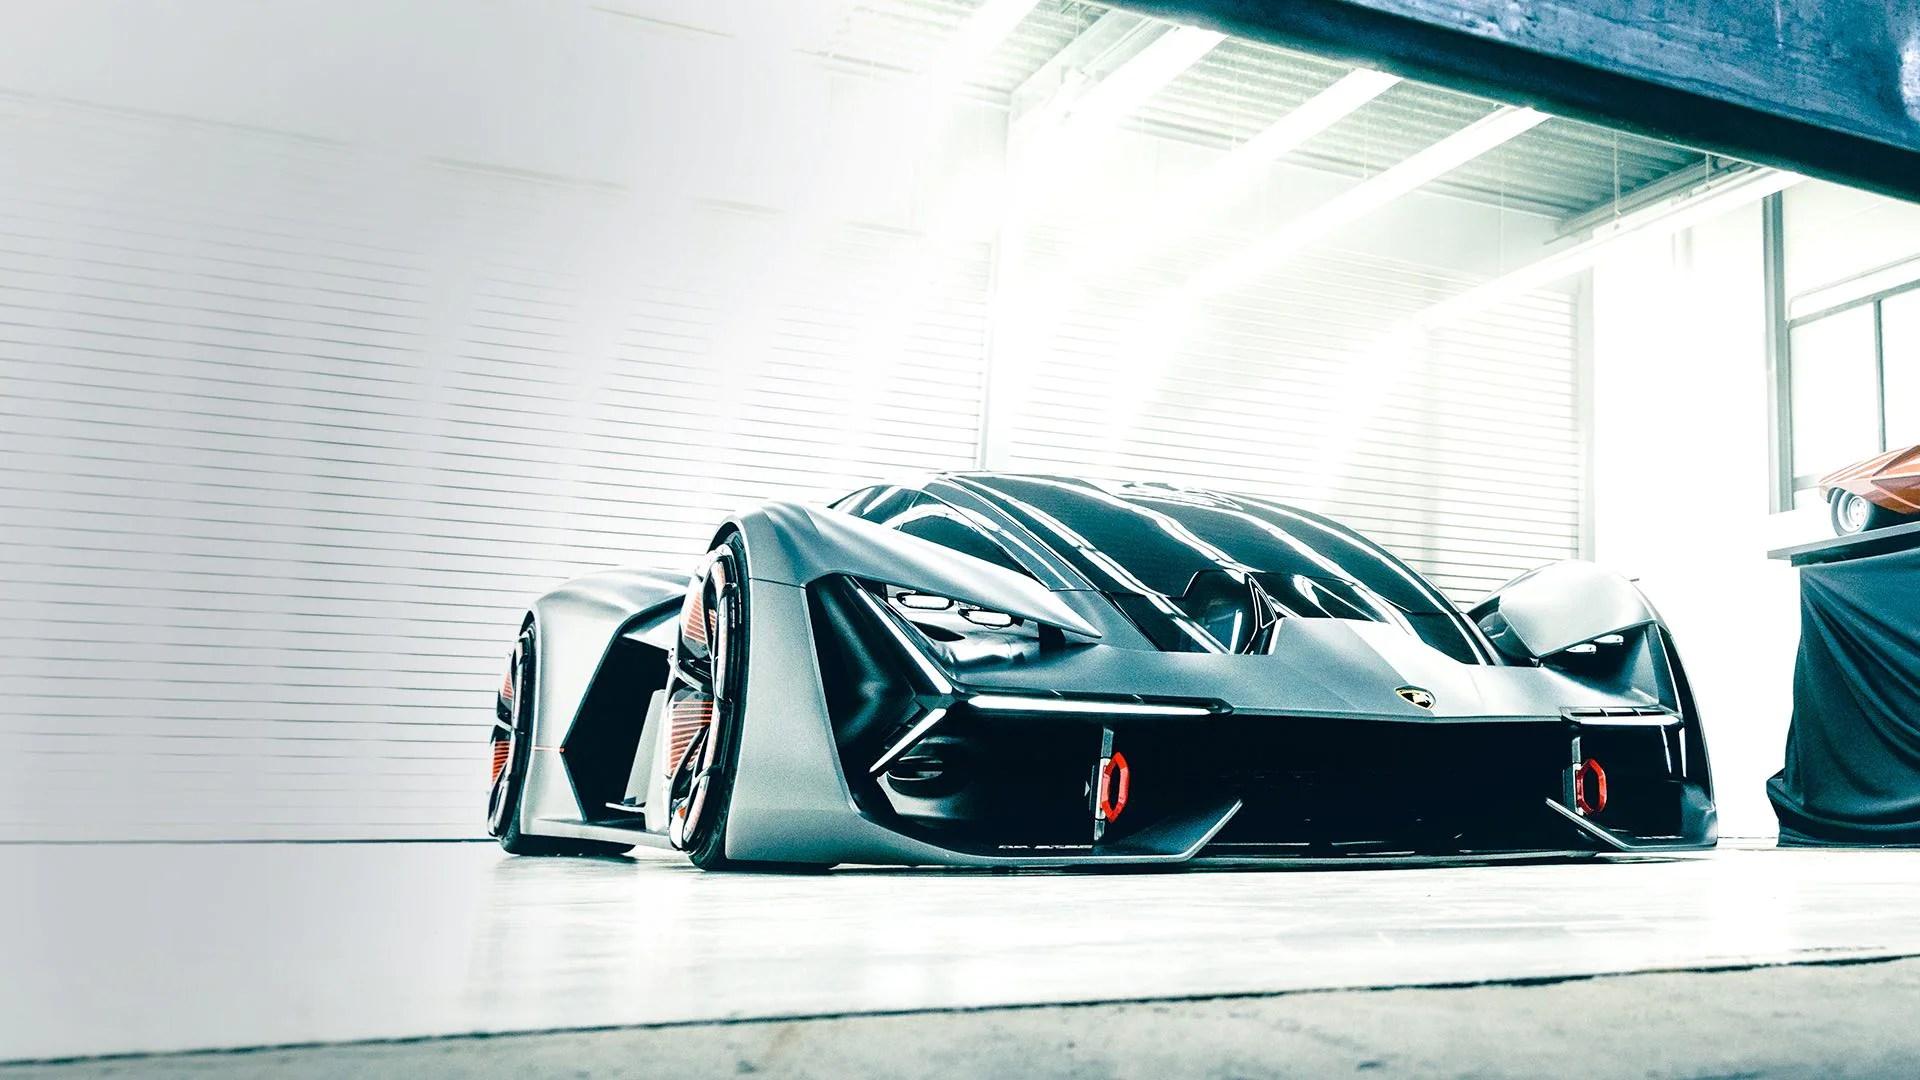 Lamborghini Veneno Wallpaper Mobile